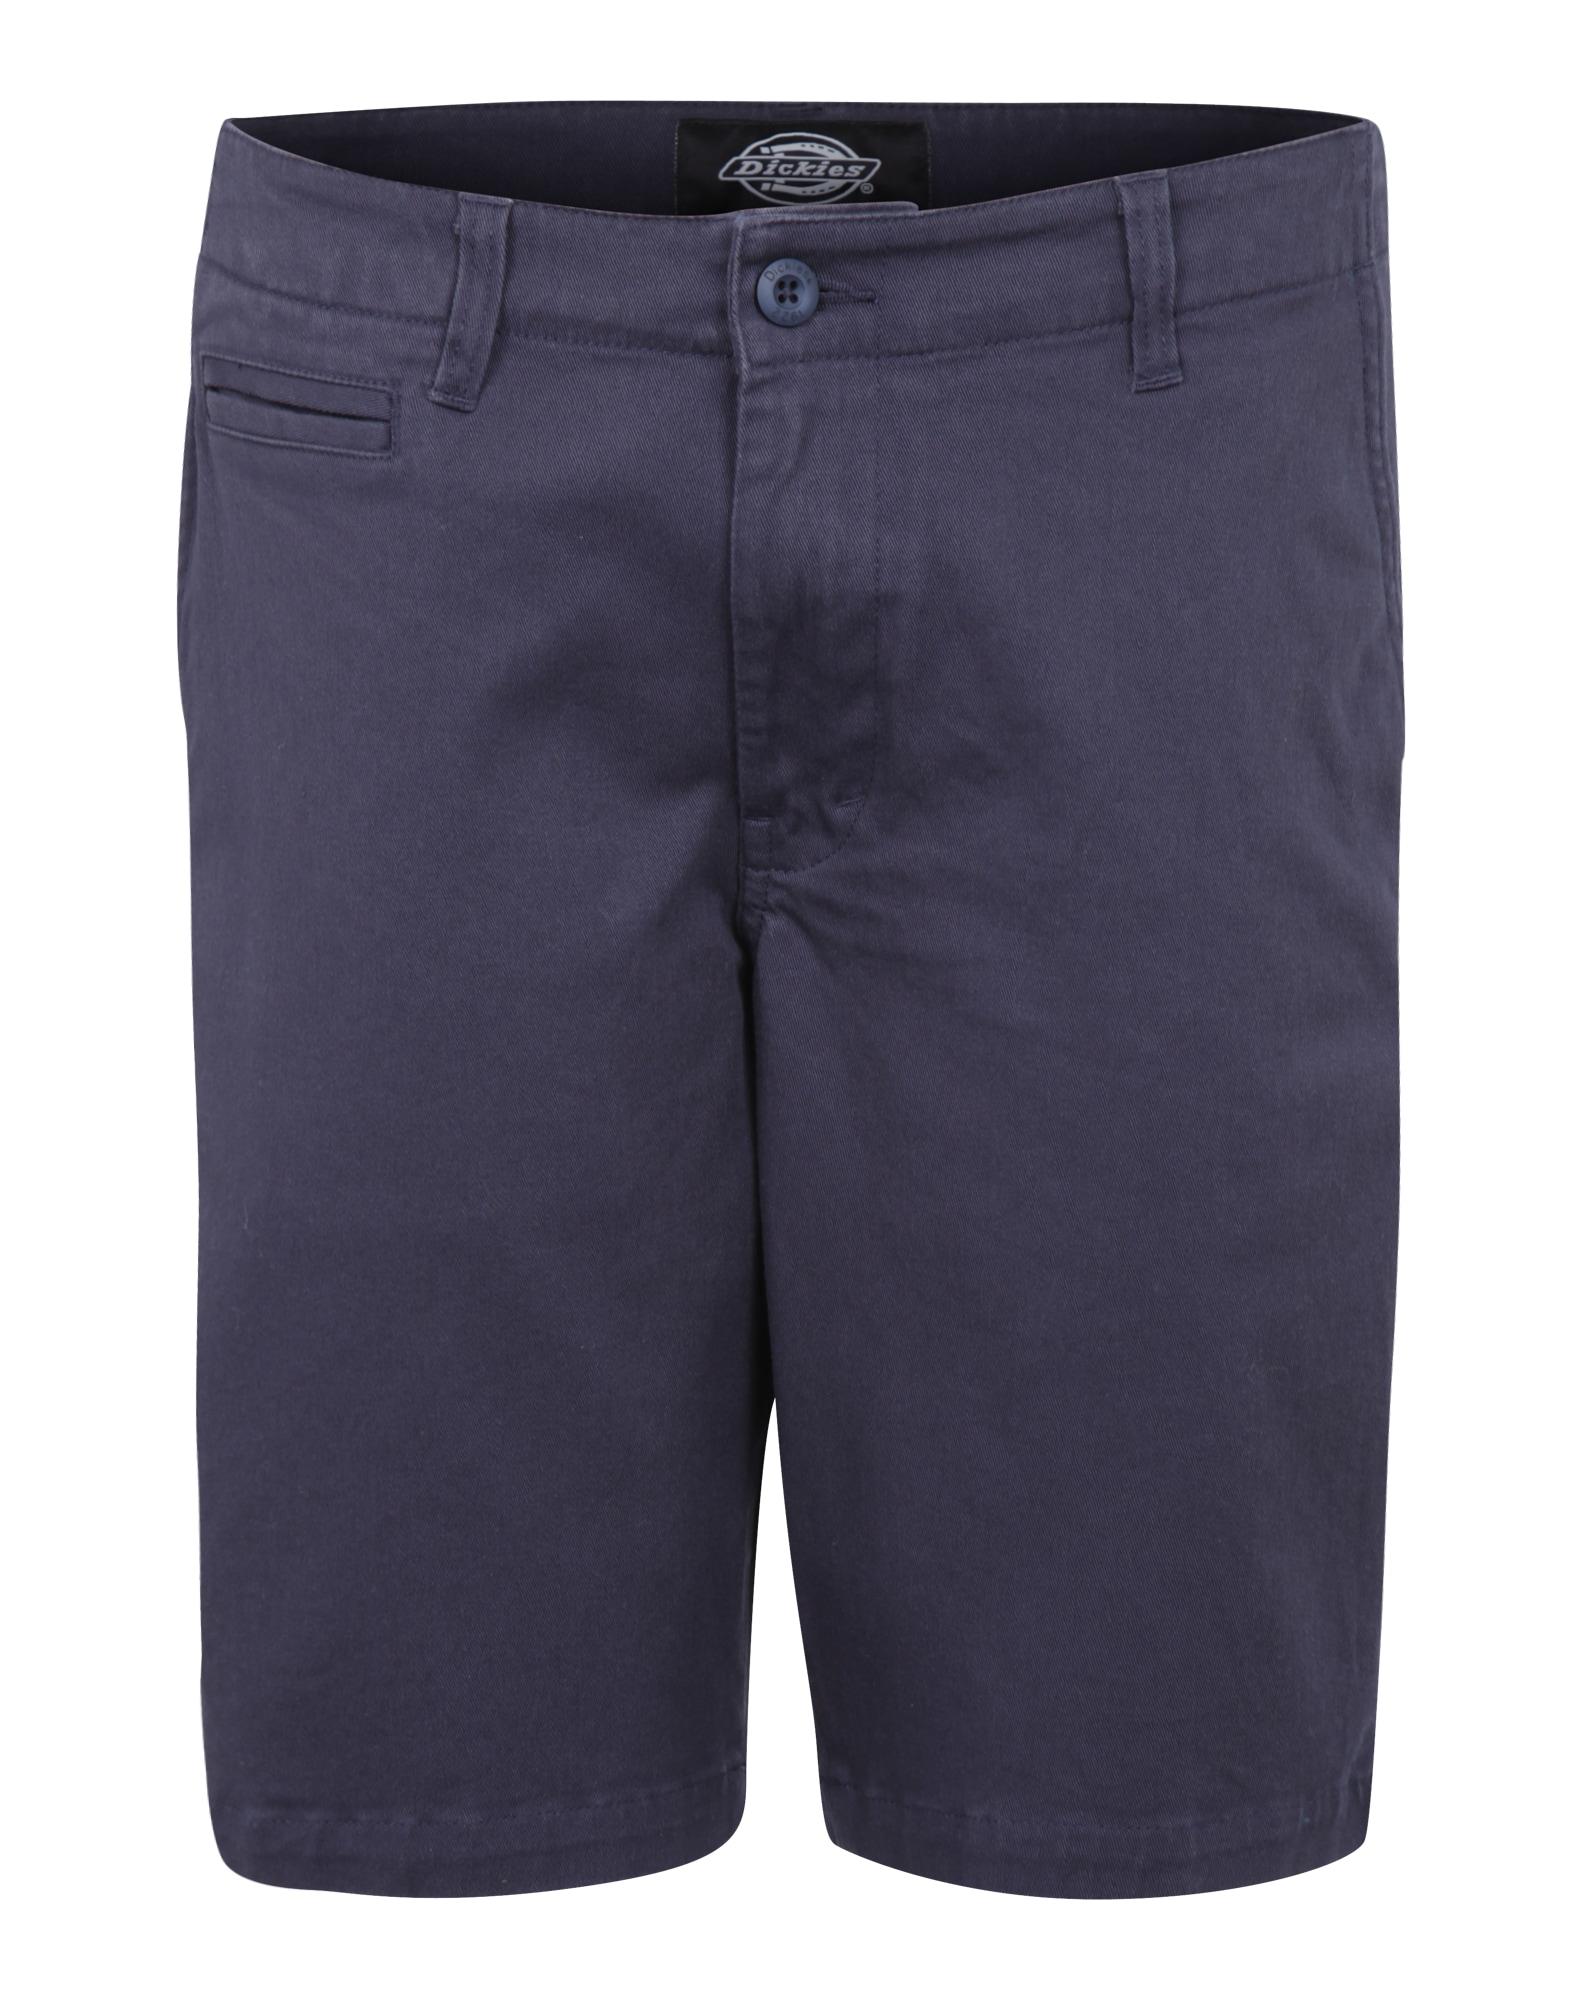 Kalhoty Palm Springs  námořnická modř  modrá DICKIES